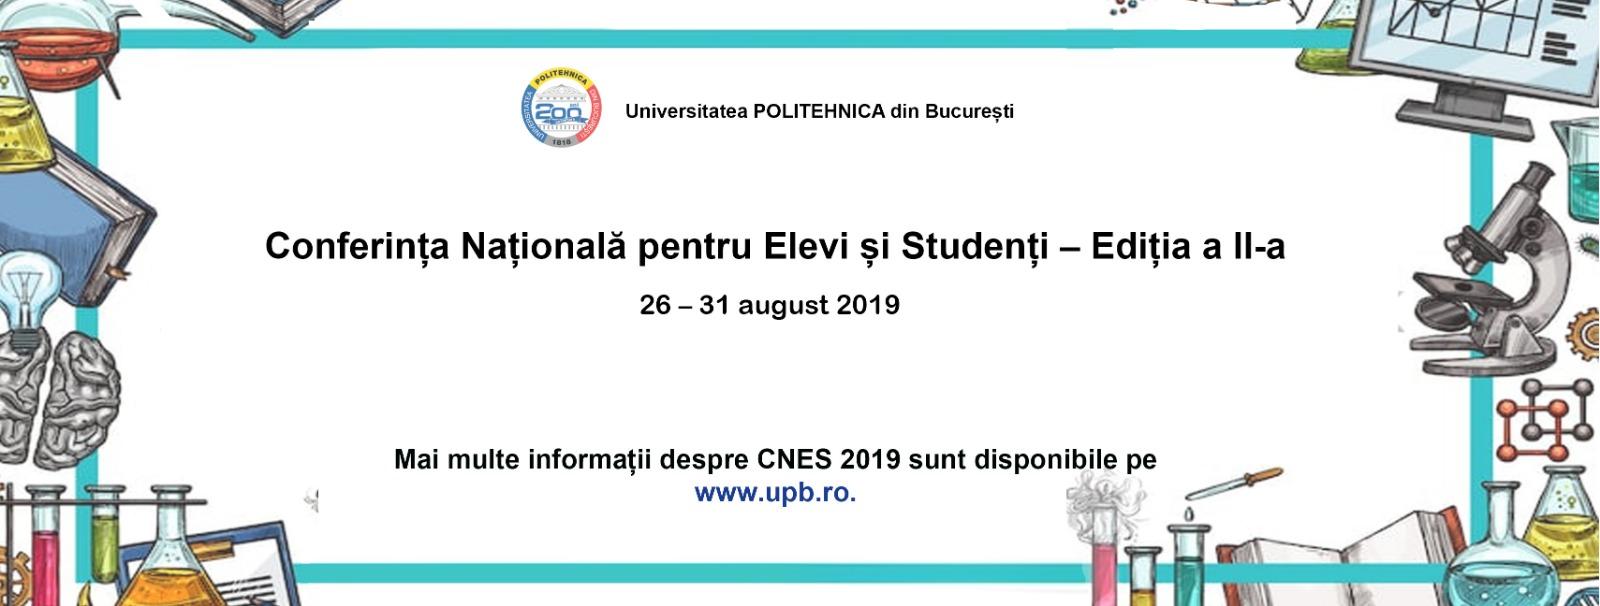 Cover Fb_CNES 2019